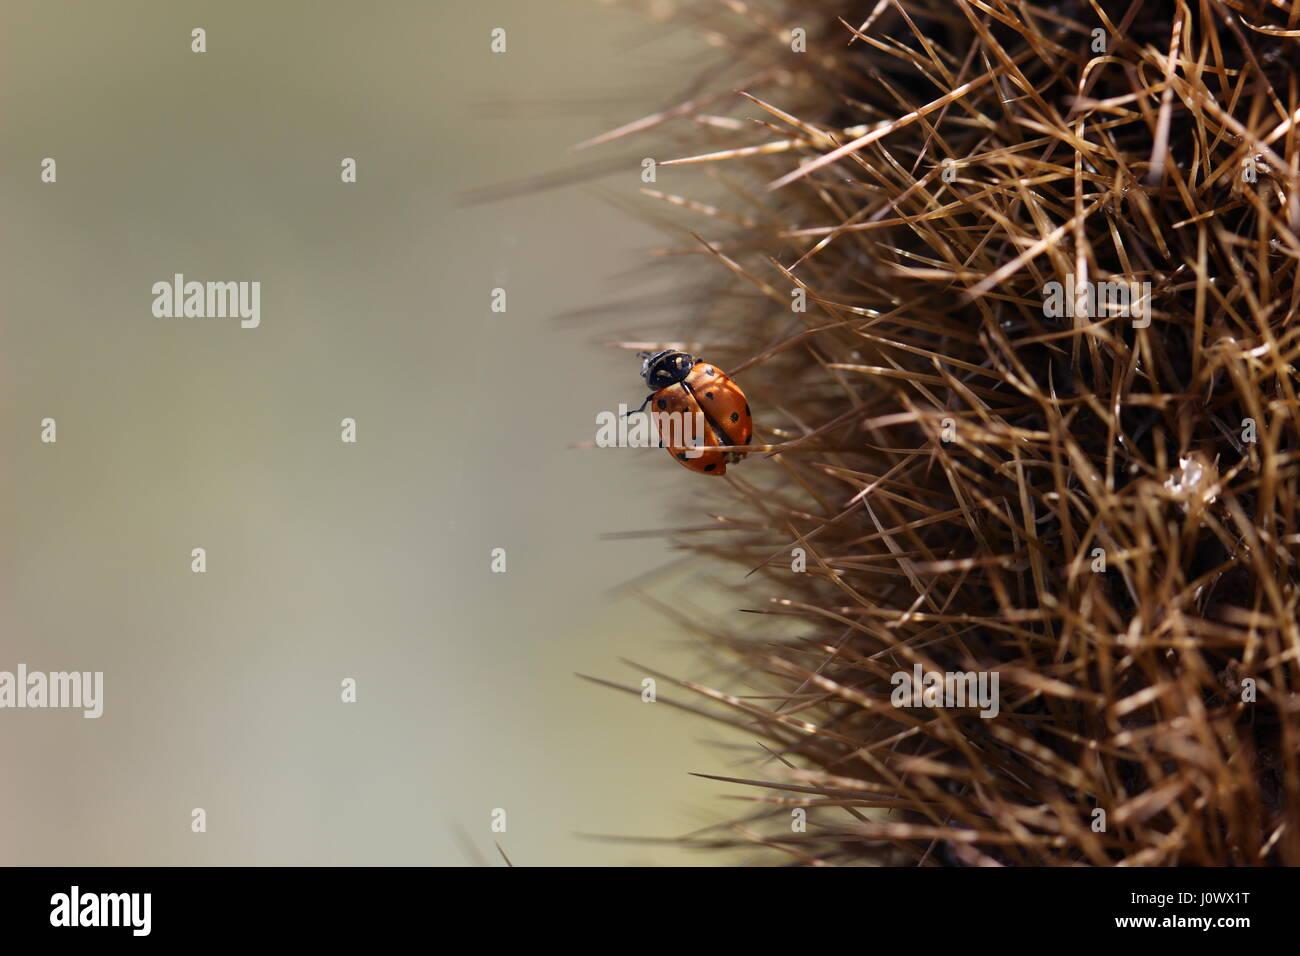 Close up macro of ladybug, or ladybird or ladybeetle (Coccinellidae), on cactus spines in California desert. Stock Photo